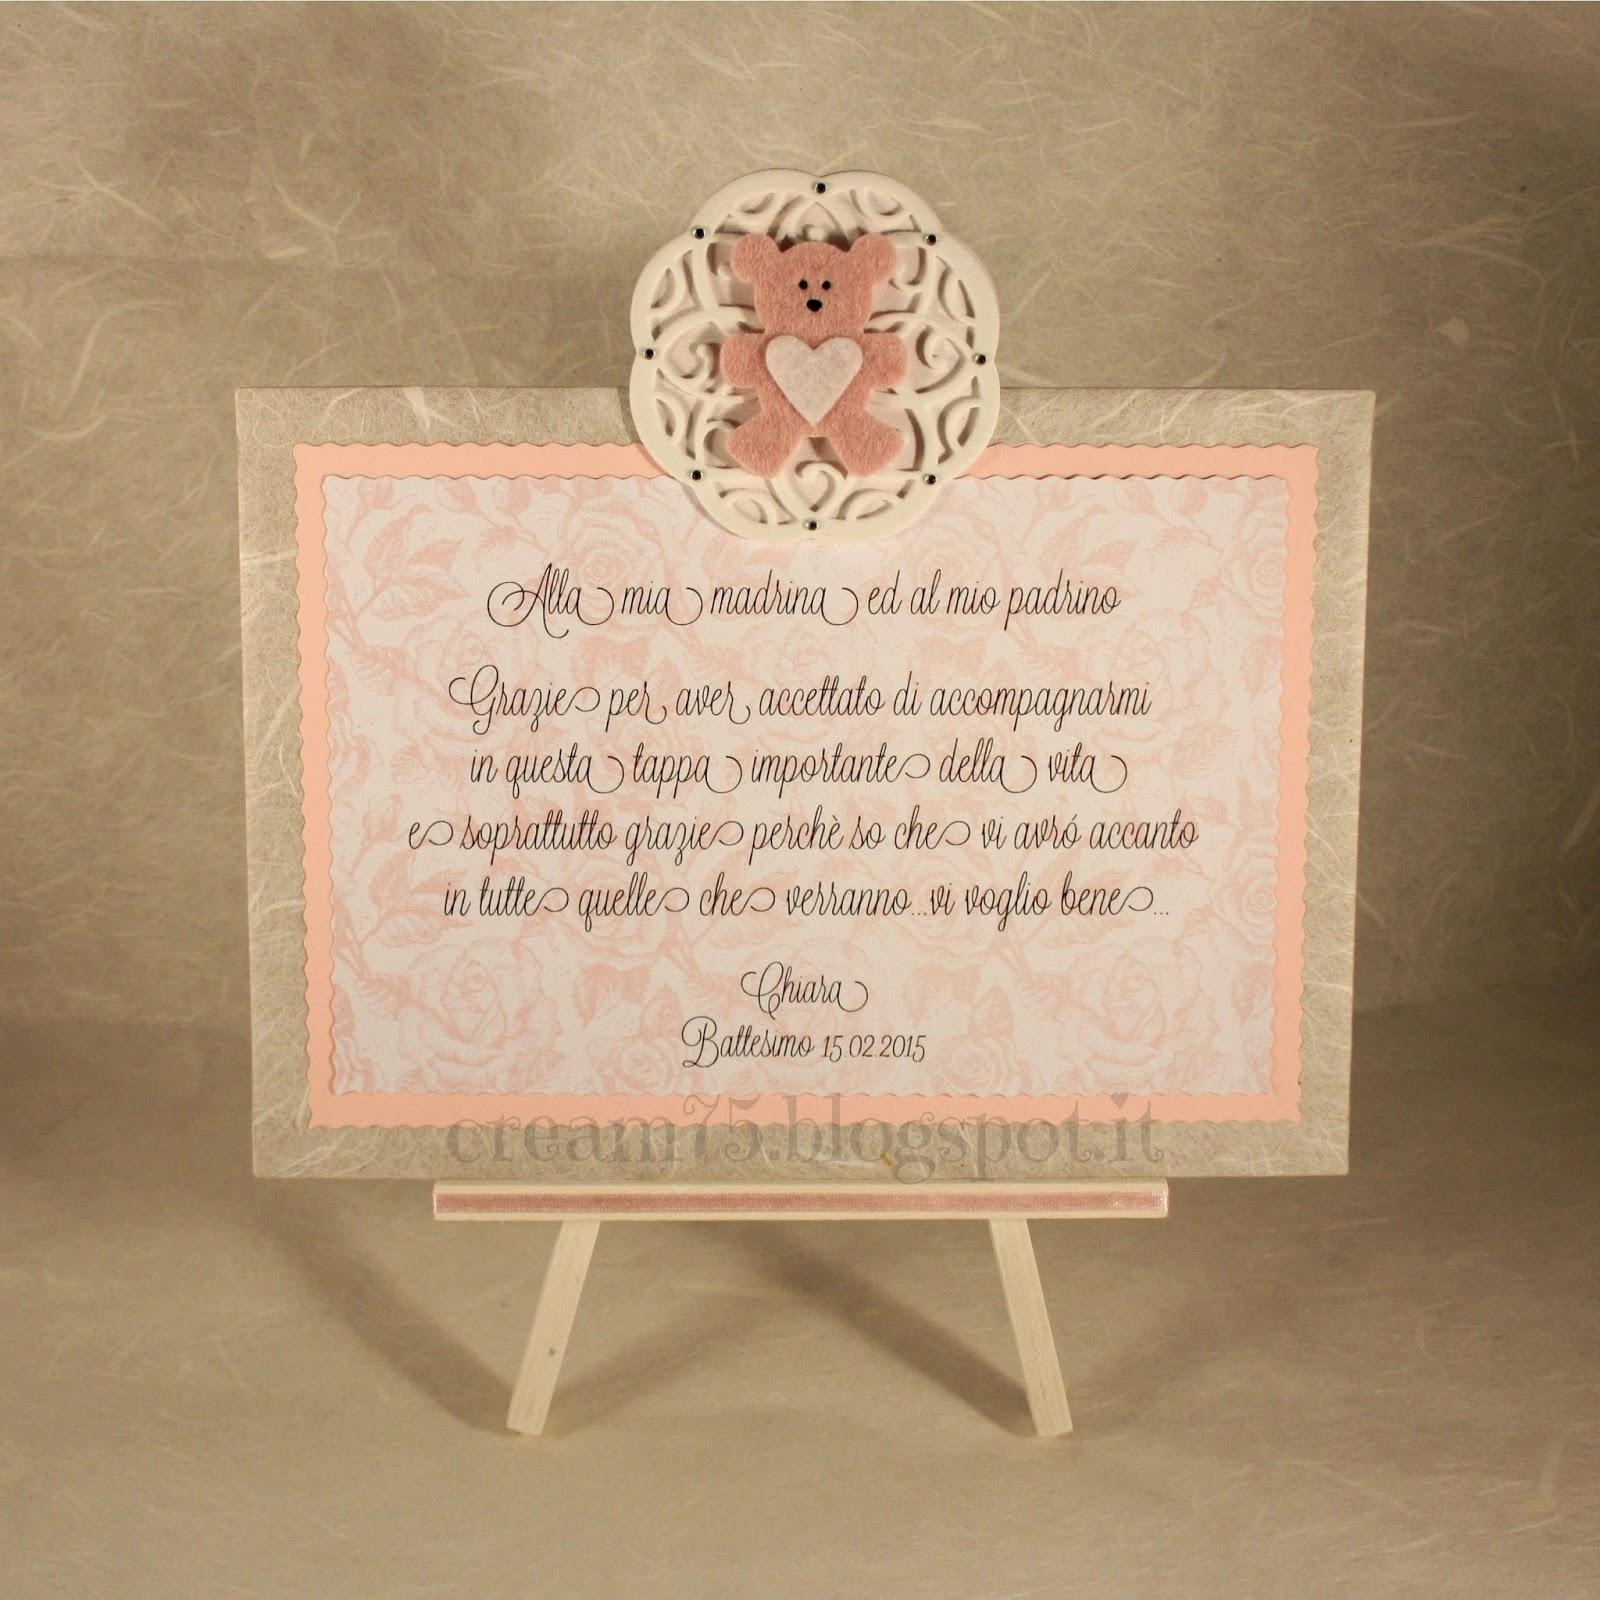 Favoloso frasi ringraziamento matrimonio prete UU42